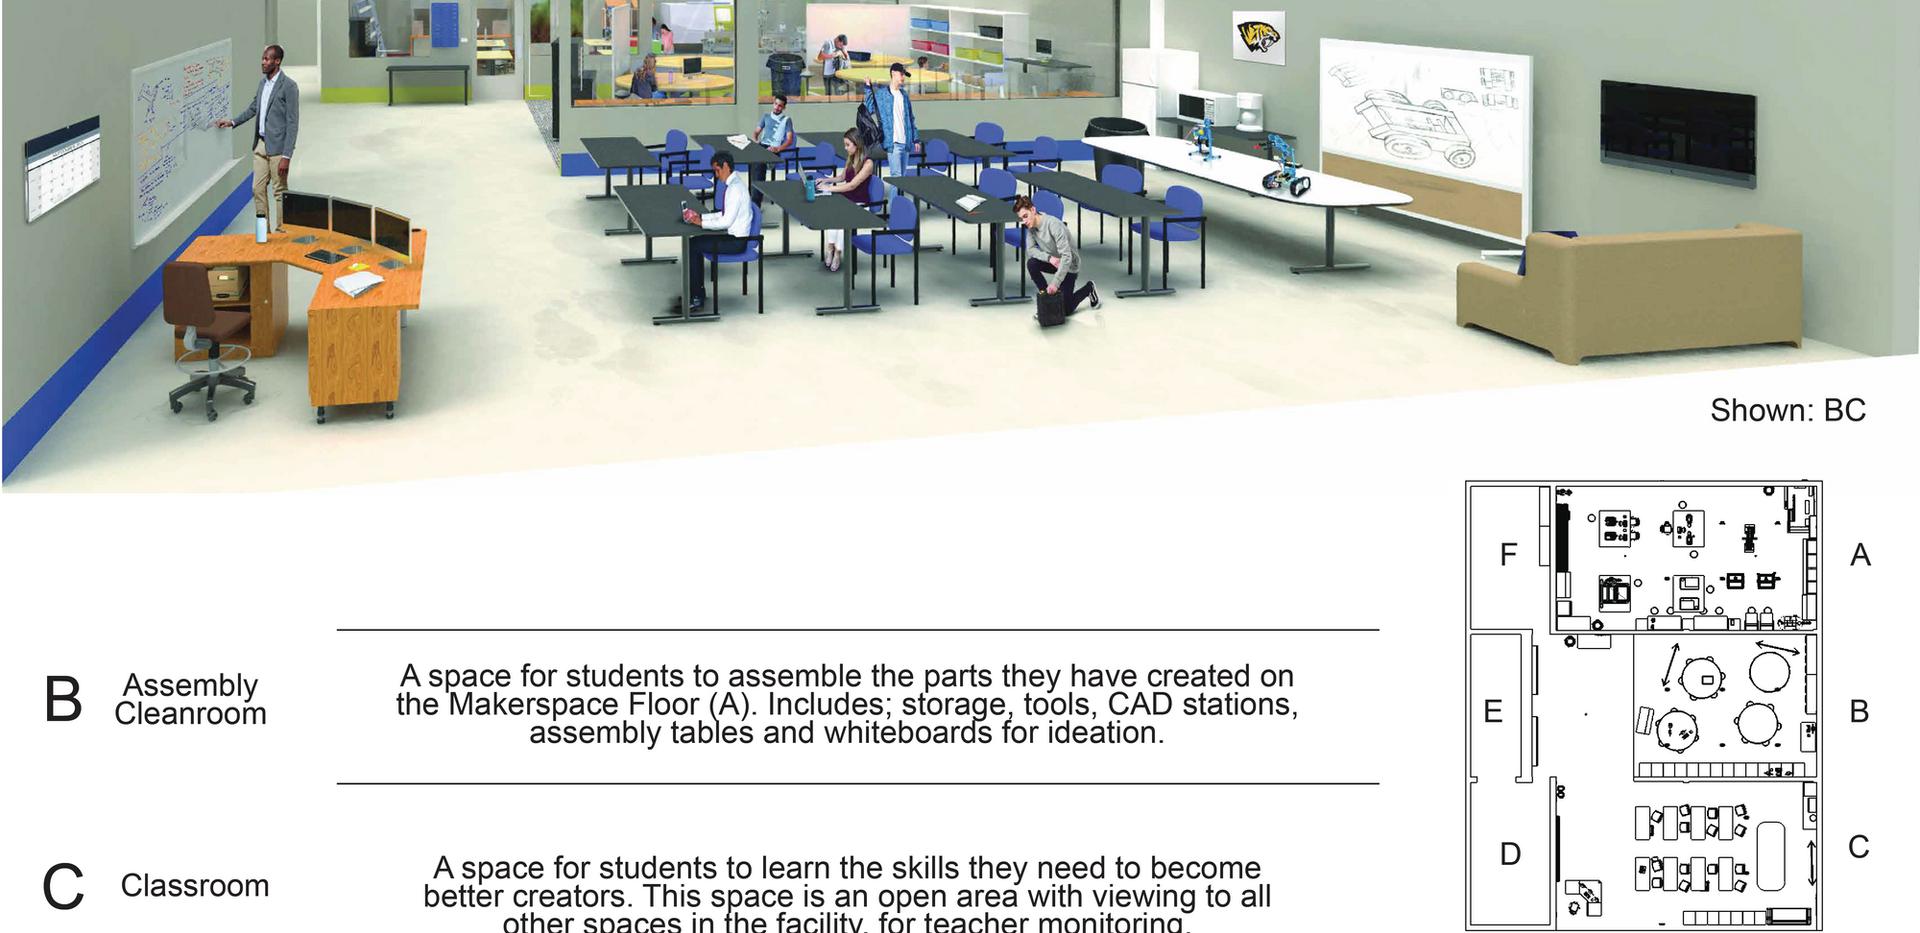 Saguaro High Makerspace: Classroom